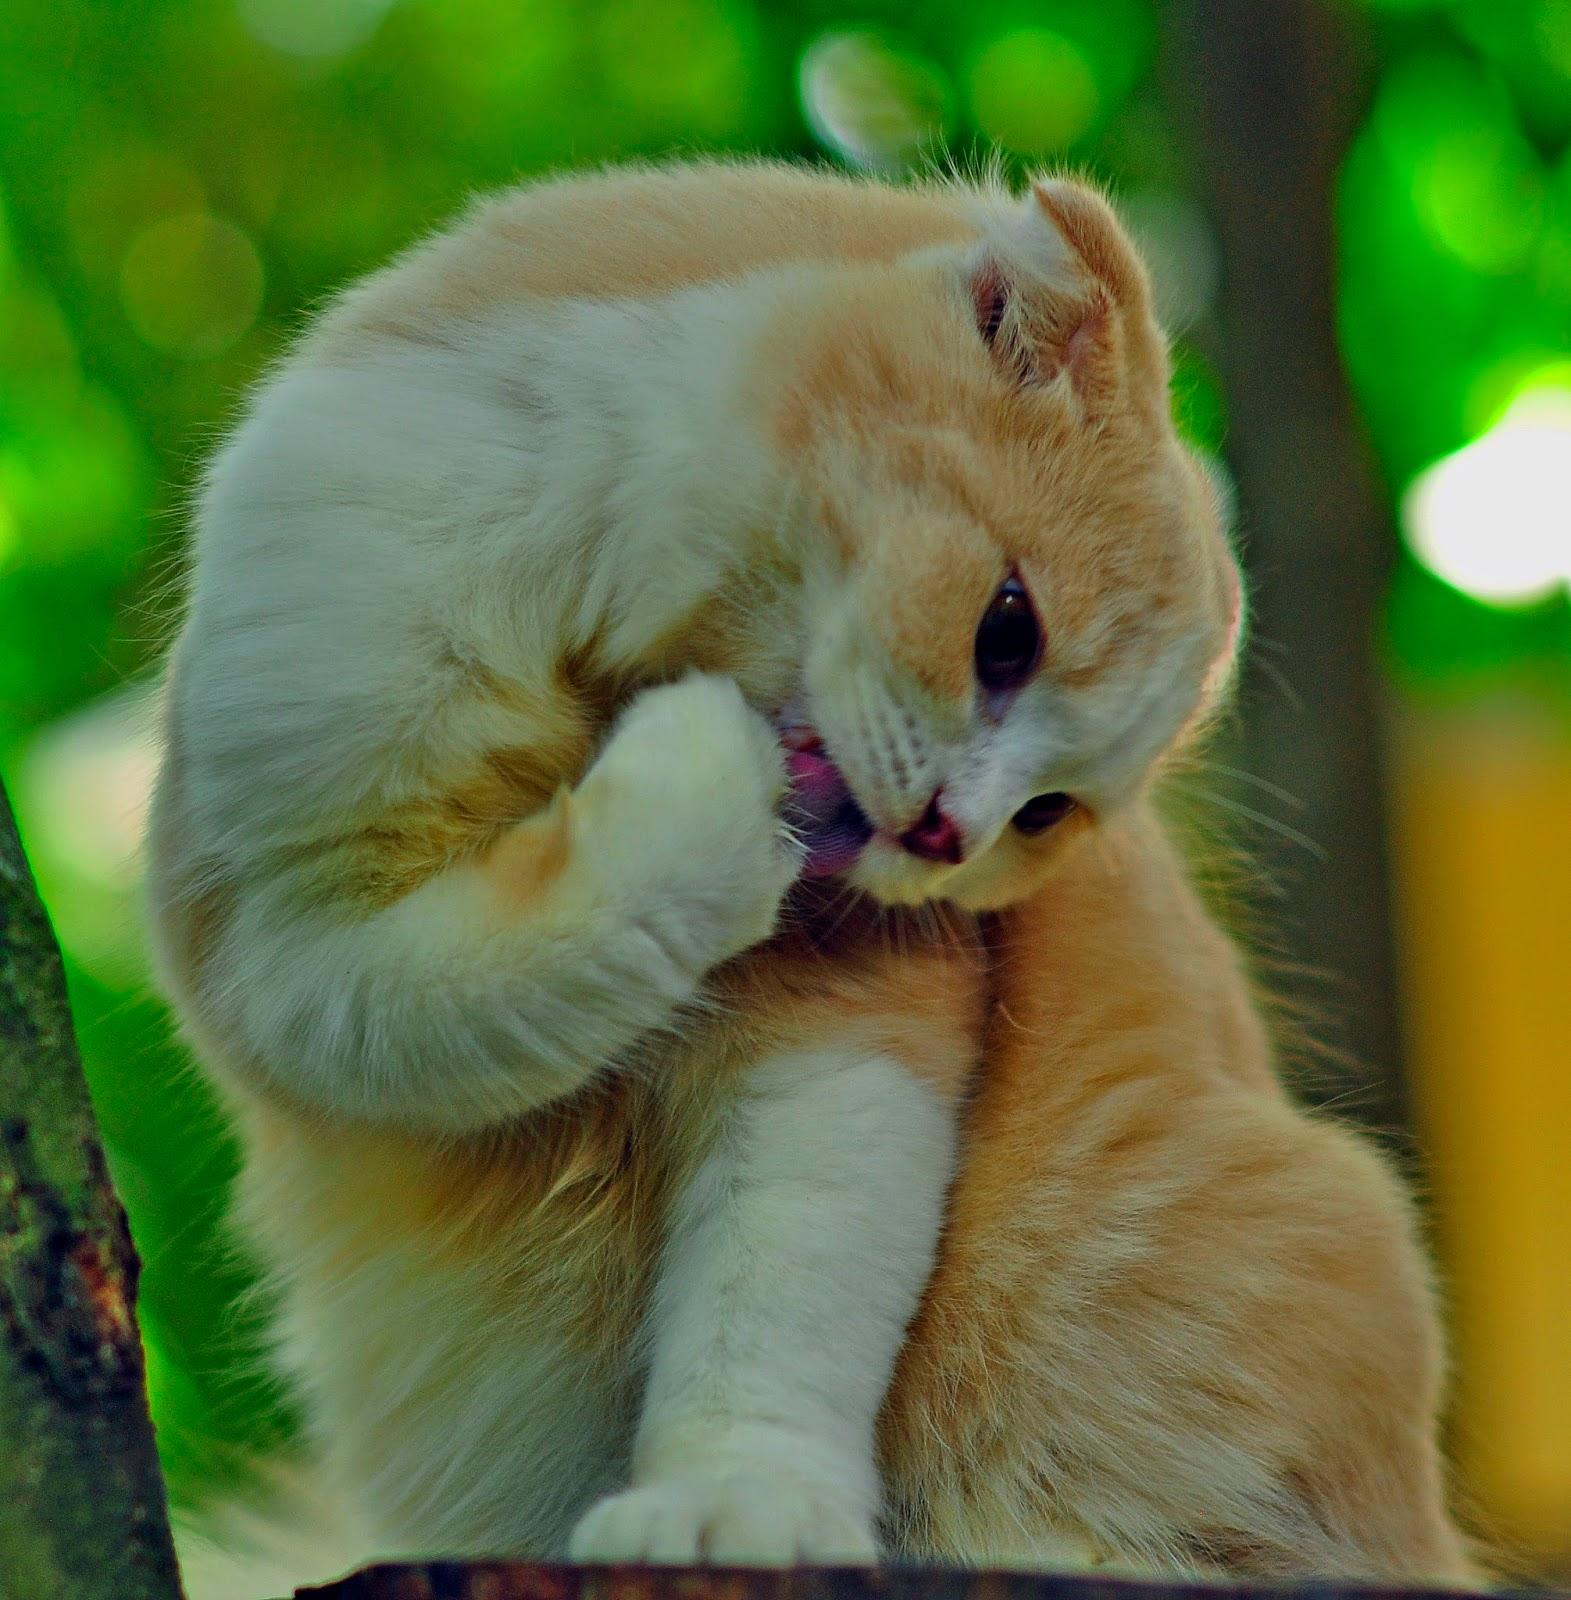 Cat Grooming 3   Memandikan Kucing sendiri.  7c07452d4c